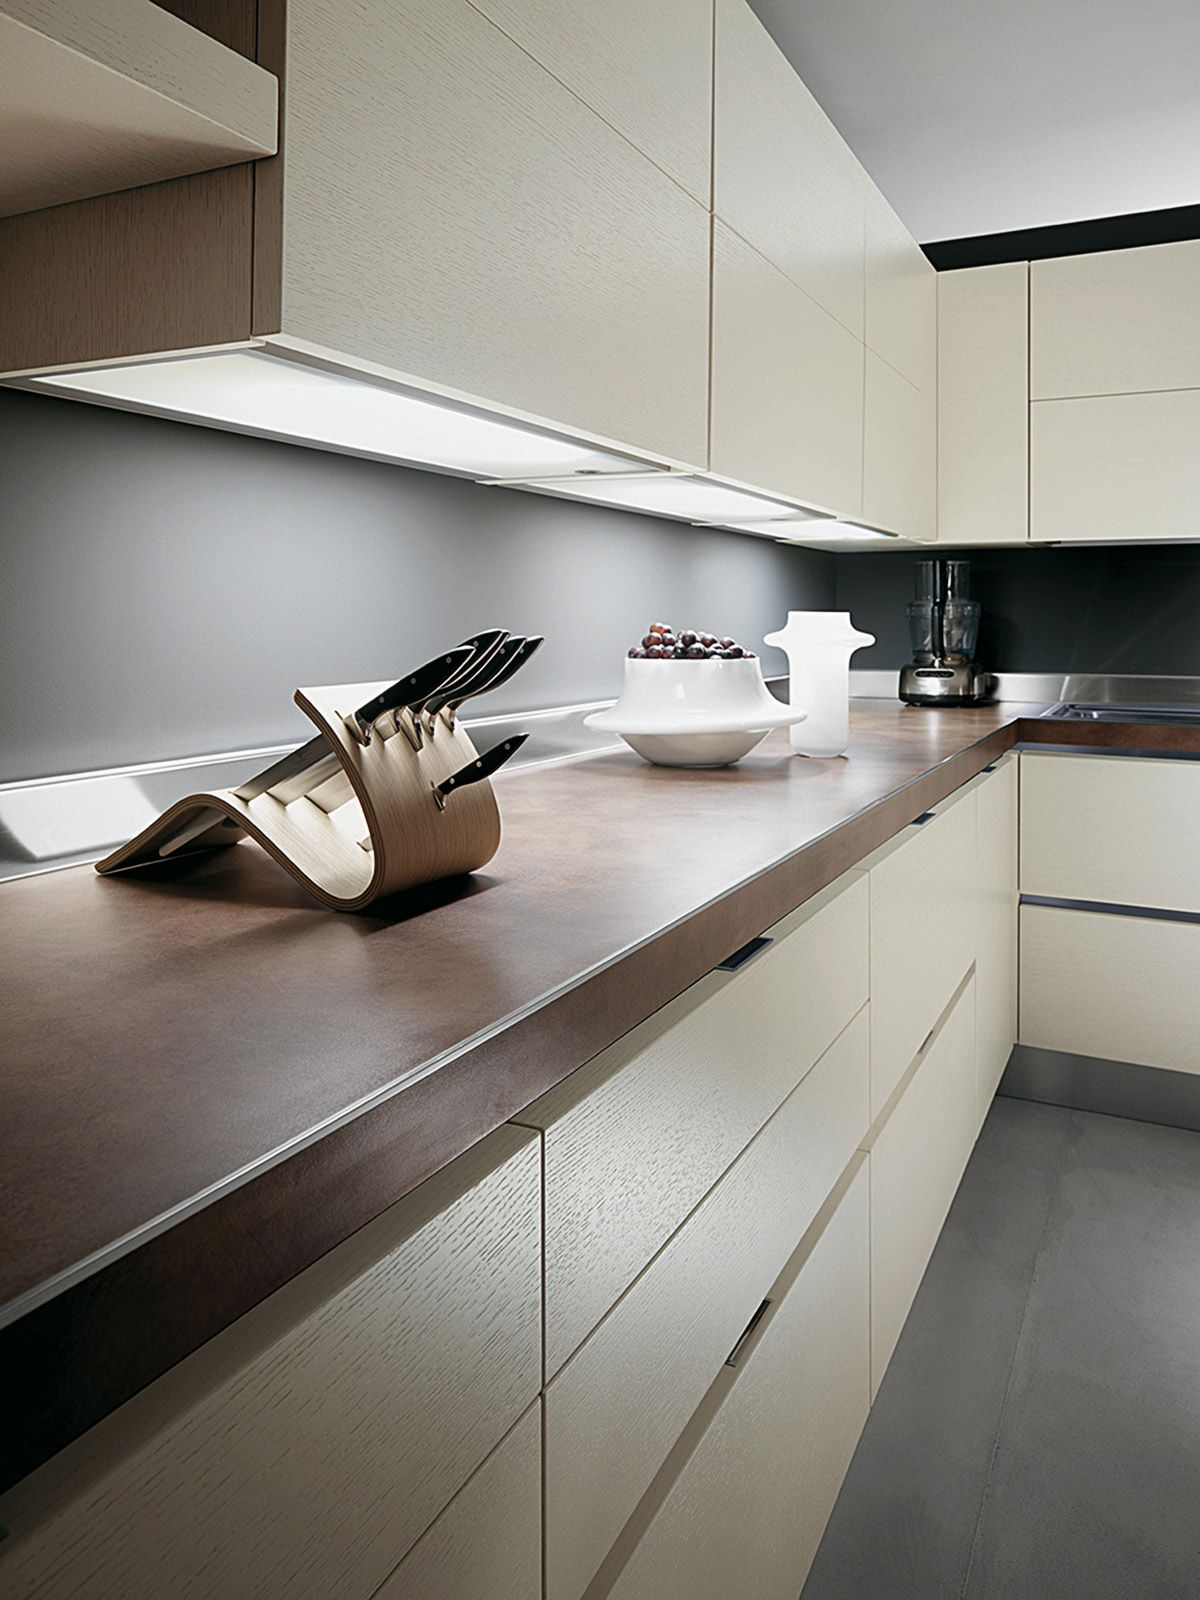 Emejing Lampade Sottopensile Cucina Ideas - Ameripest.us ...